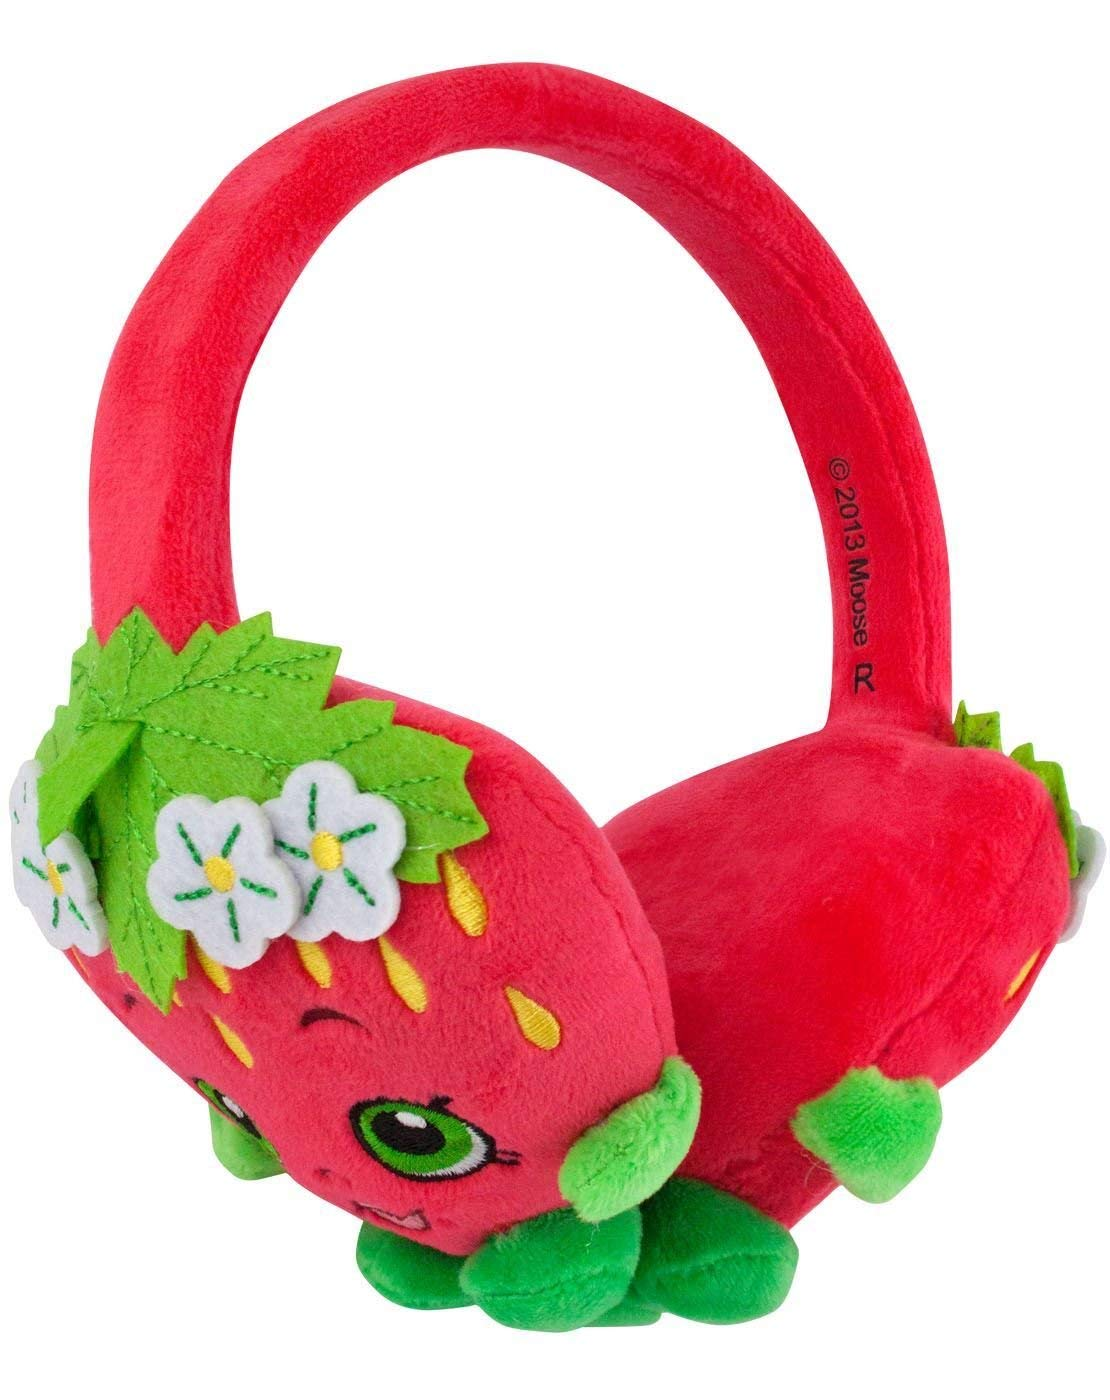 Shopkins Plush Kids Headphones/Headband for Audio/DVD/MP3/iPad